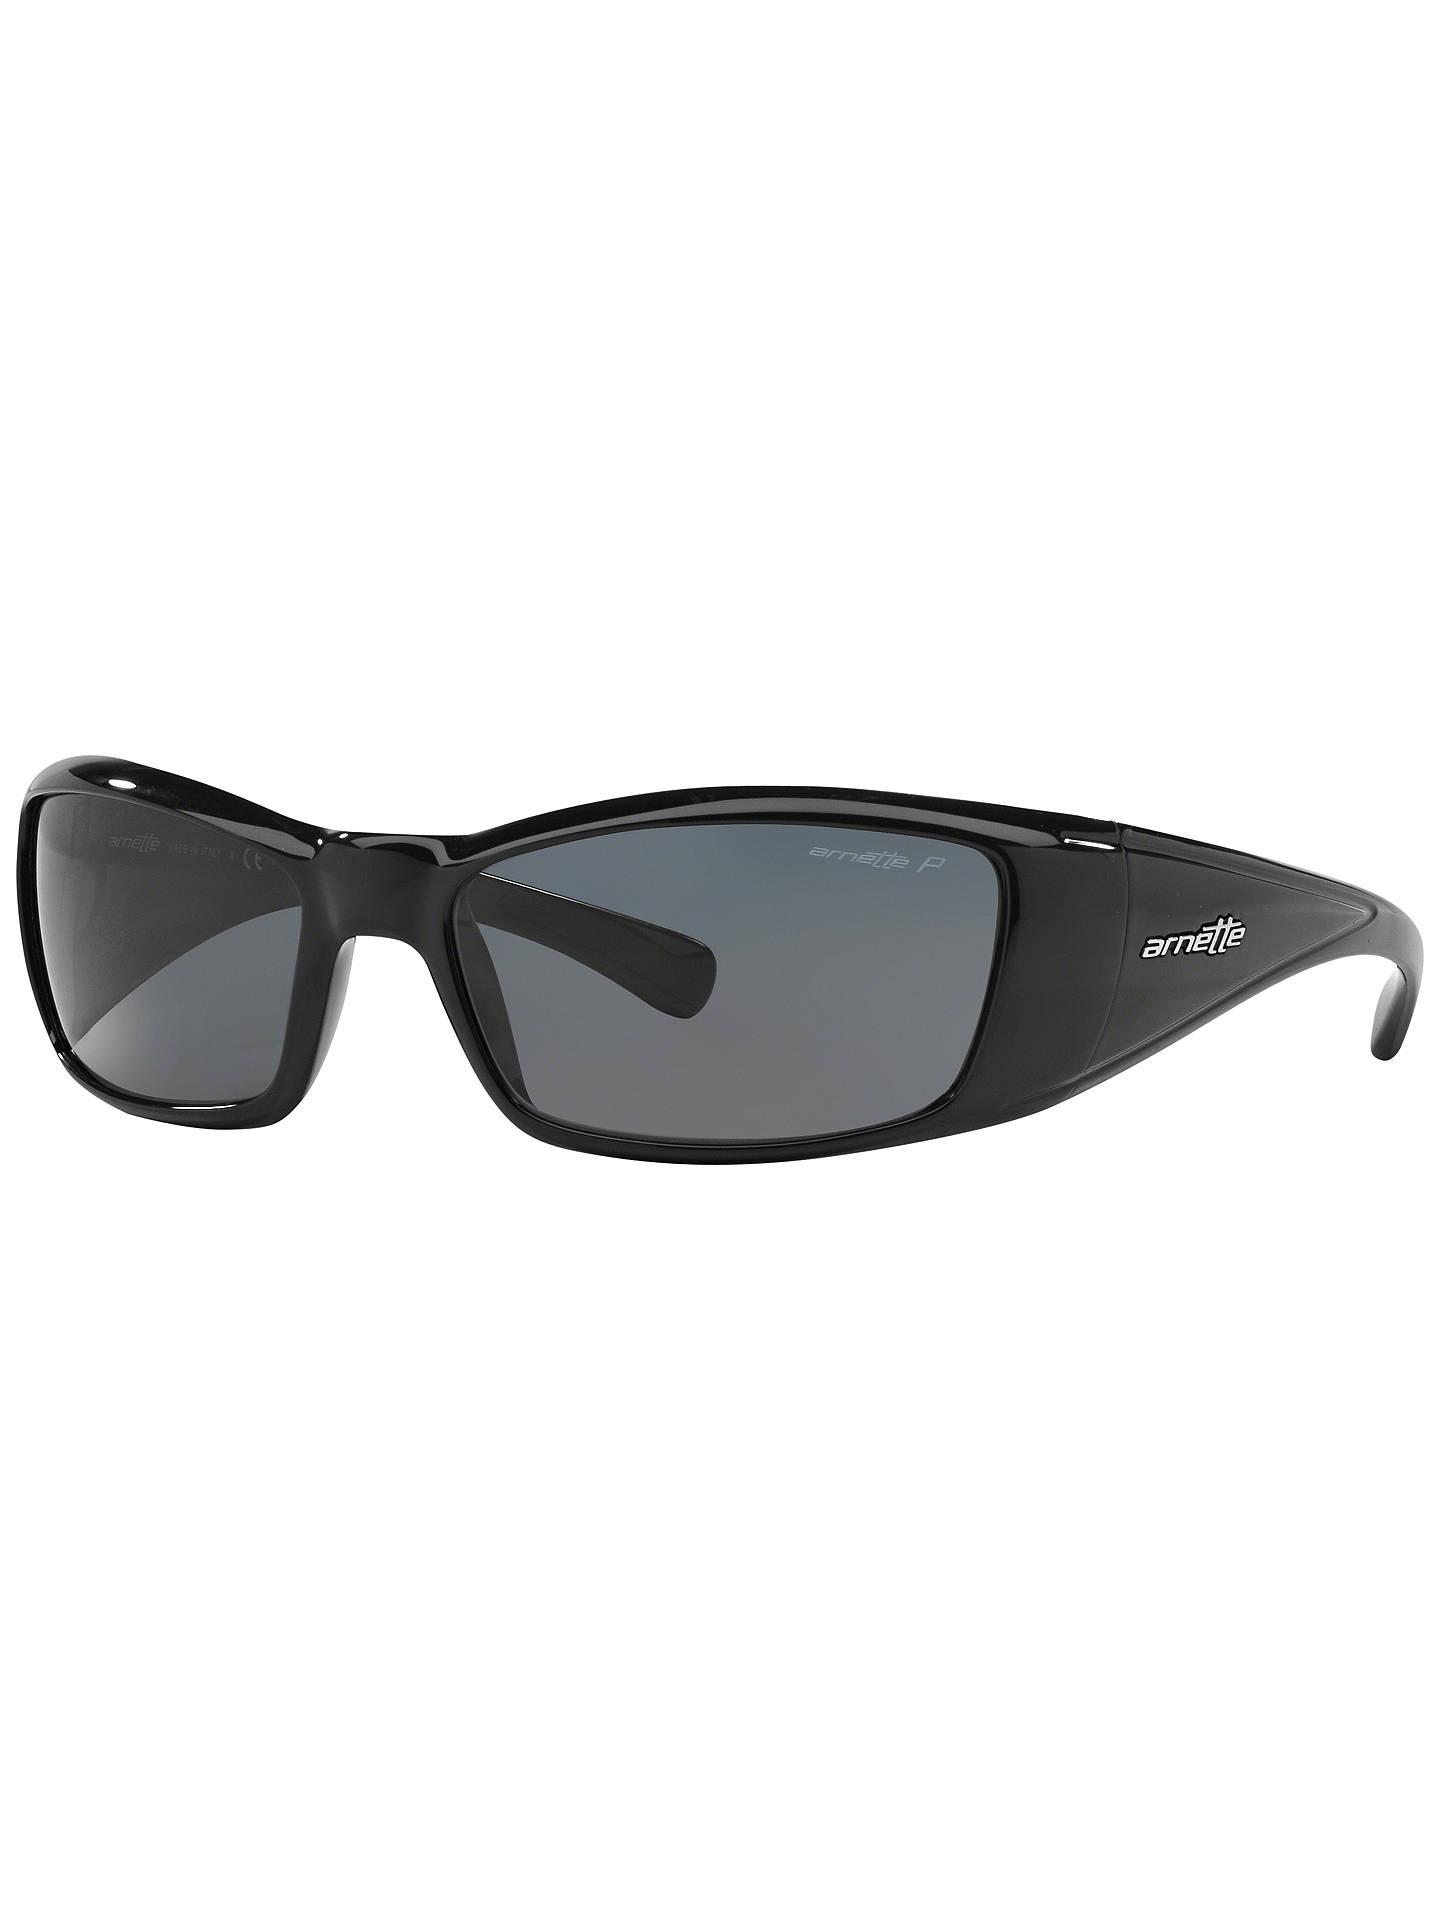 92f351acb2bd Buy Arnette AN4077 Rage XL Rectangle Sunglasses, Black Online at  johnlewis.com ...